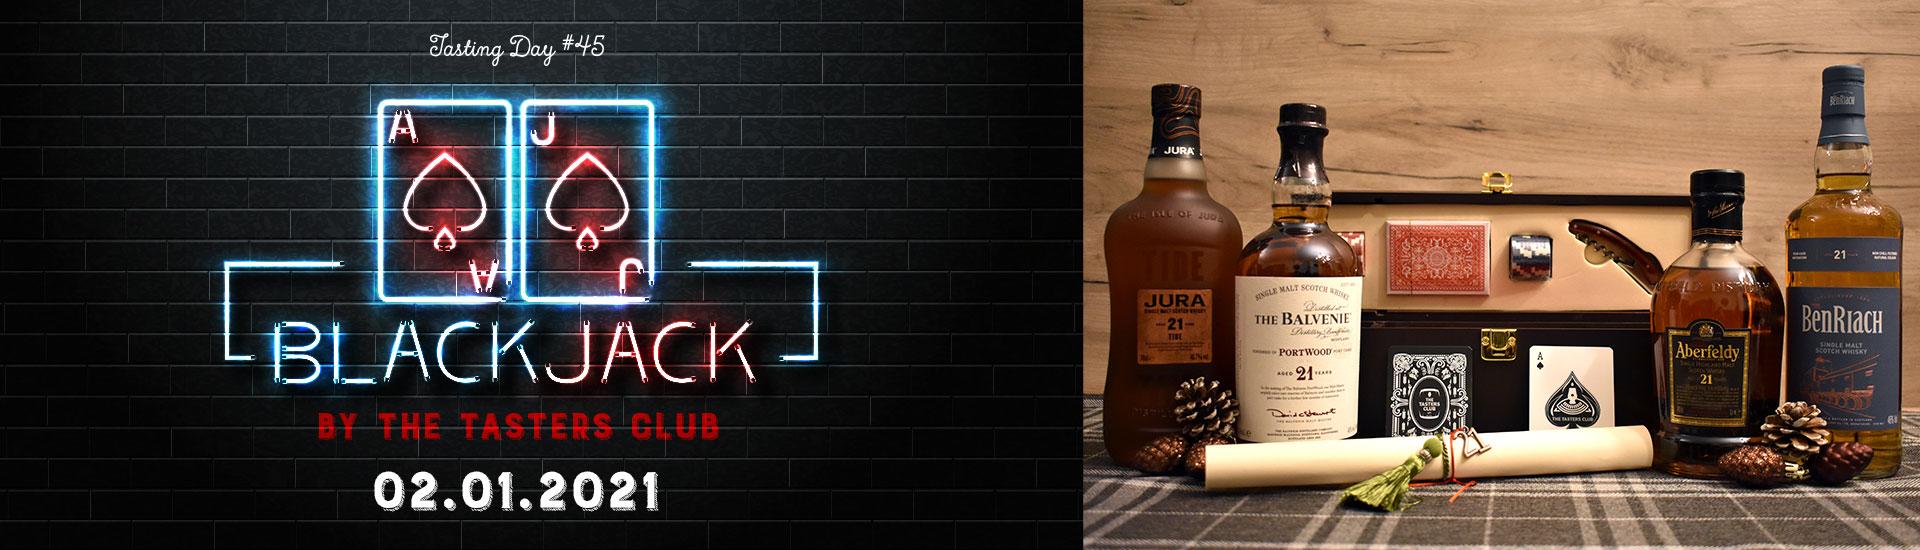 The Tasters Club Tasting Day #45 21 years old whisky tasting